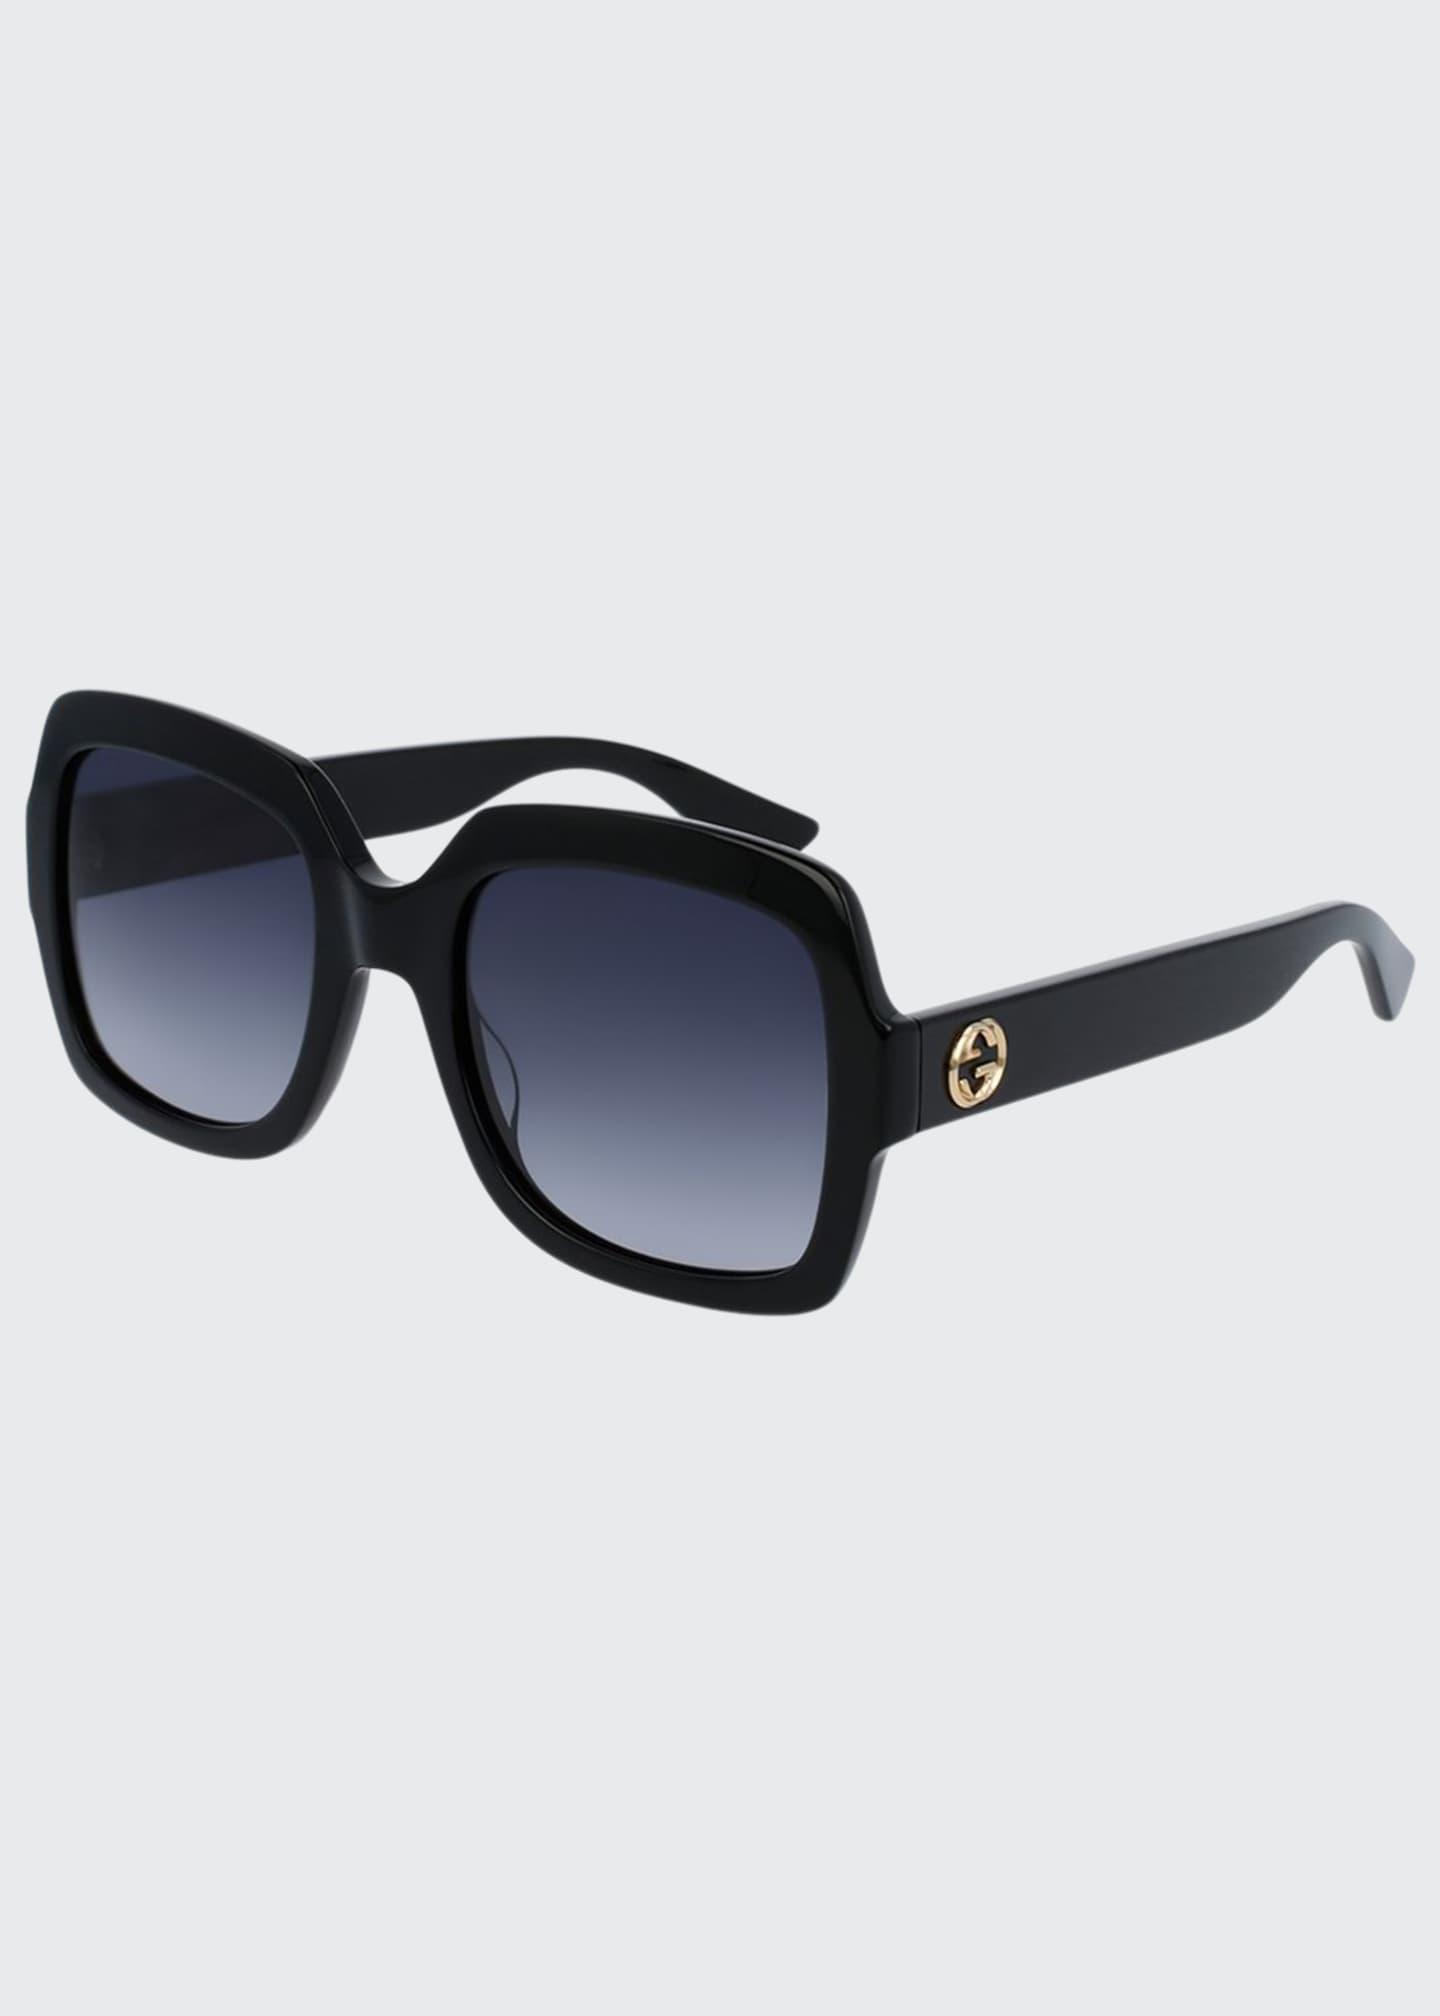 Gucci Classic Oversized Rectangular Sunglasses, Black